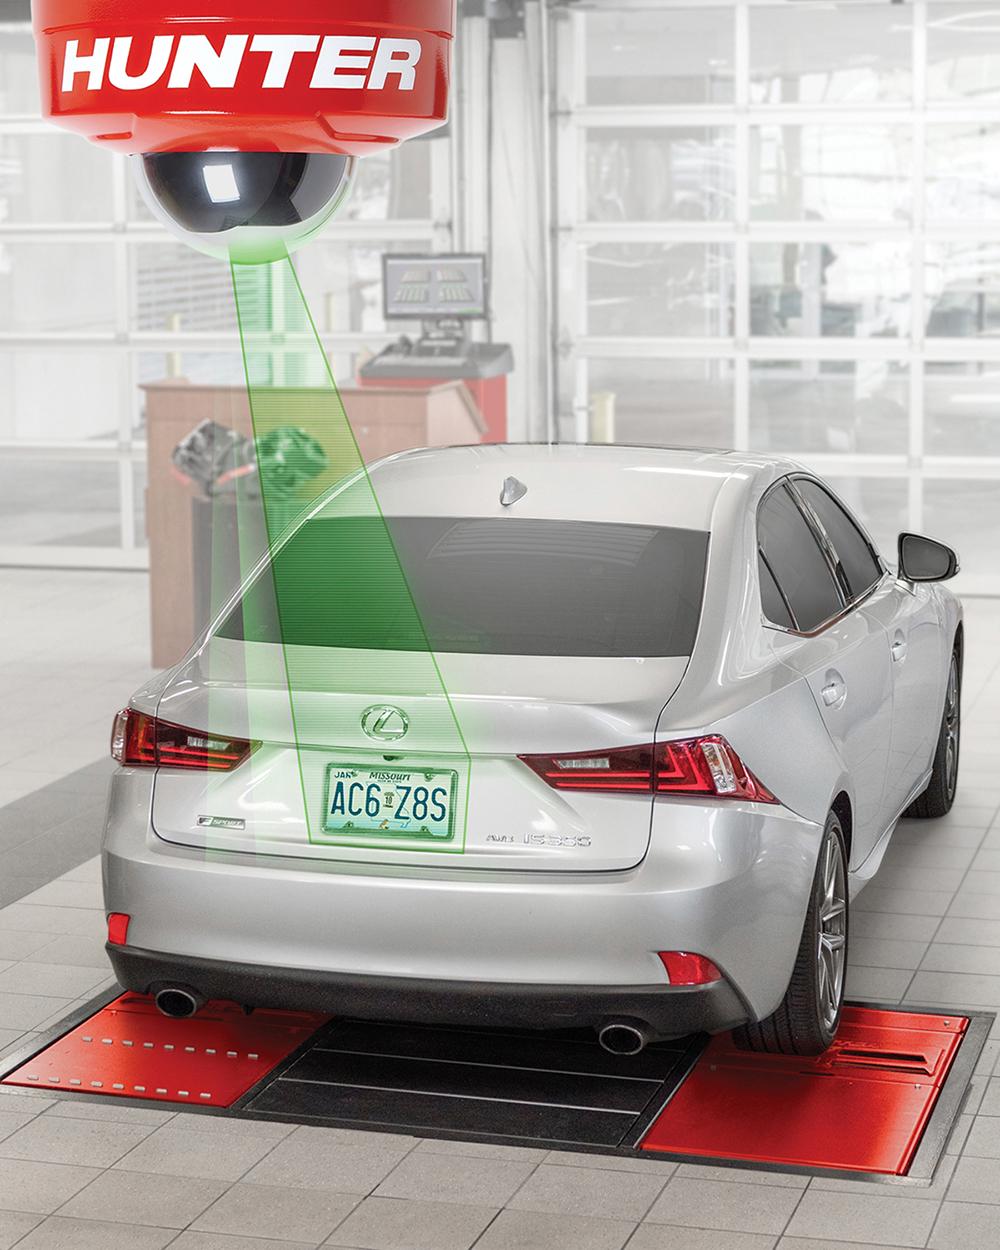 Hunter's Quick ID Technology Automates Vehicle Identification